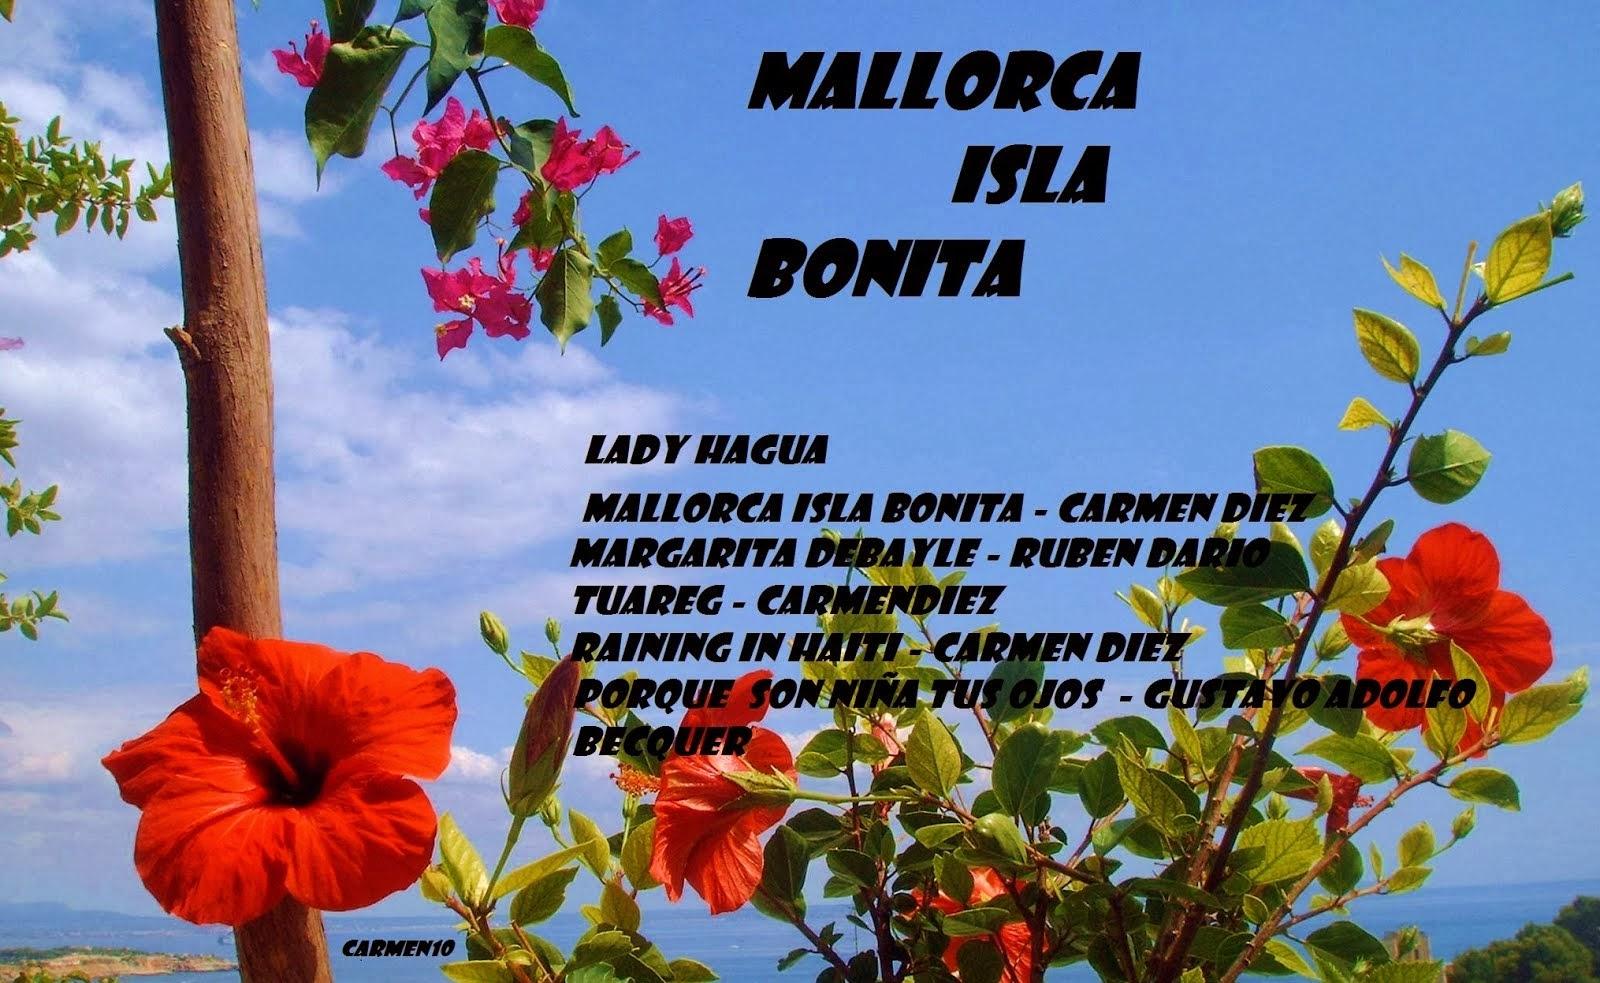 MALLORCA ISLA BONITA -  LADY HAGUA